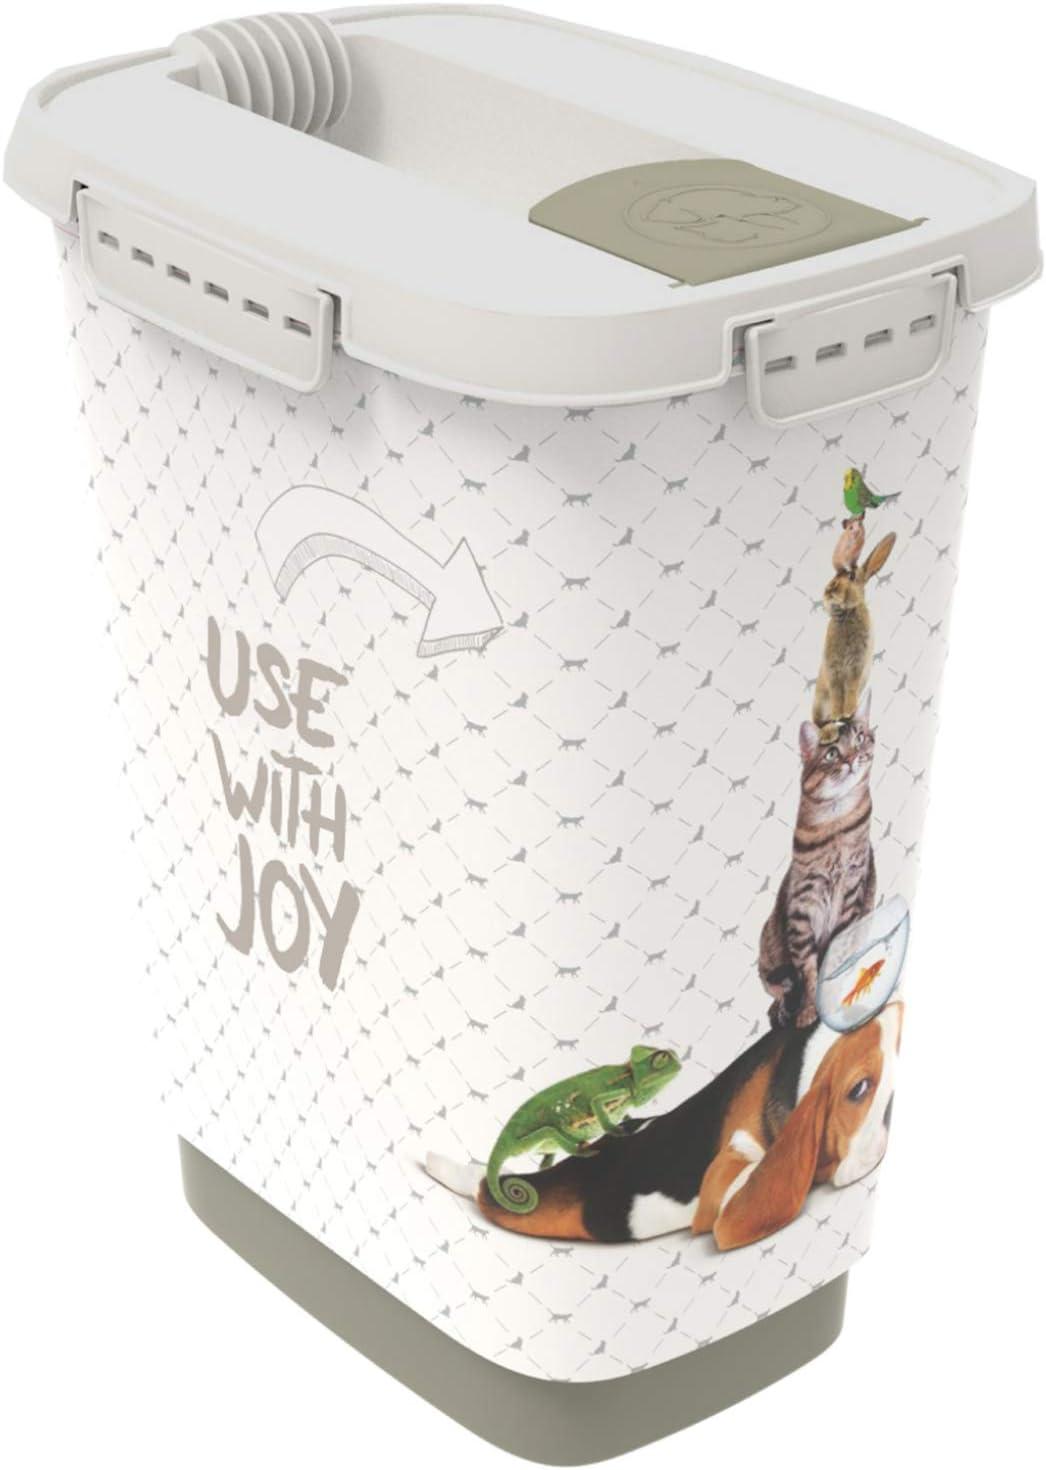 Sundis myPET Container Cody 10L Joy Contenedor Tapa Adaptada para Verter La Comida, Blanco/Capuccino